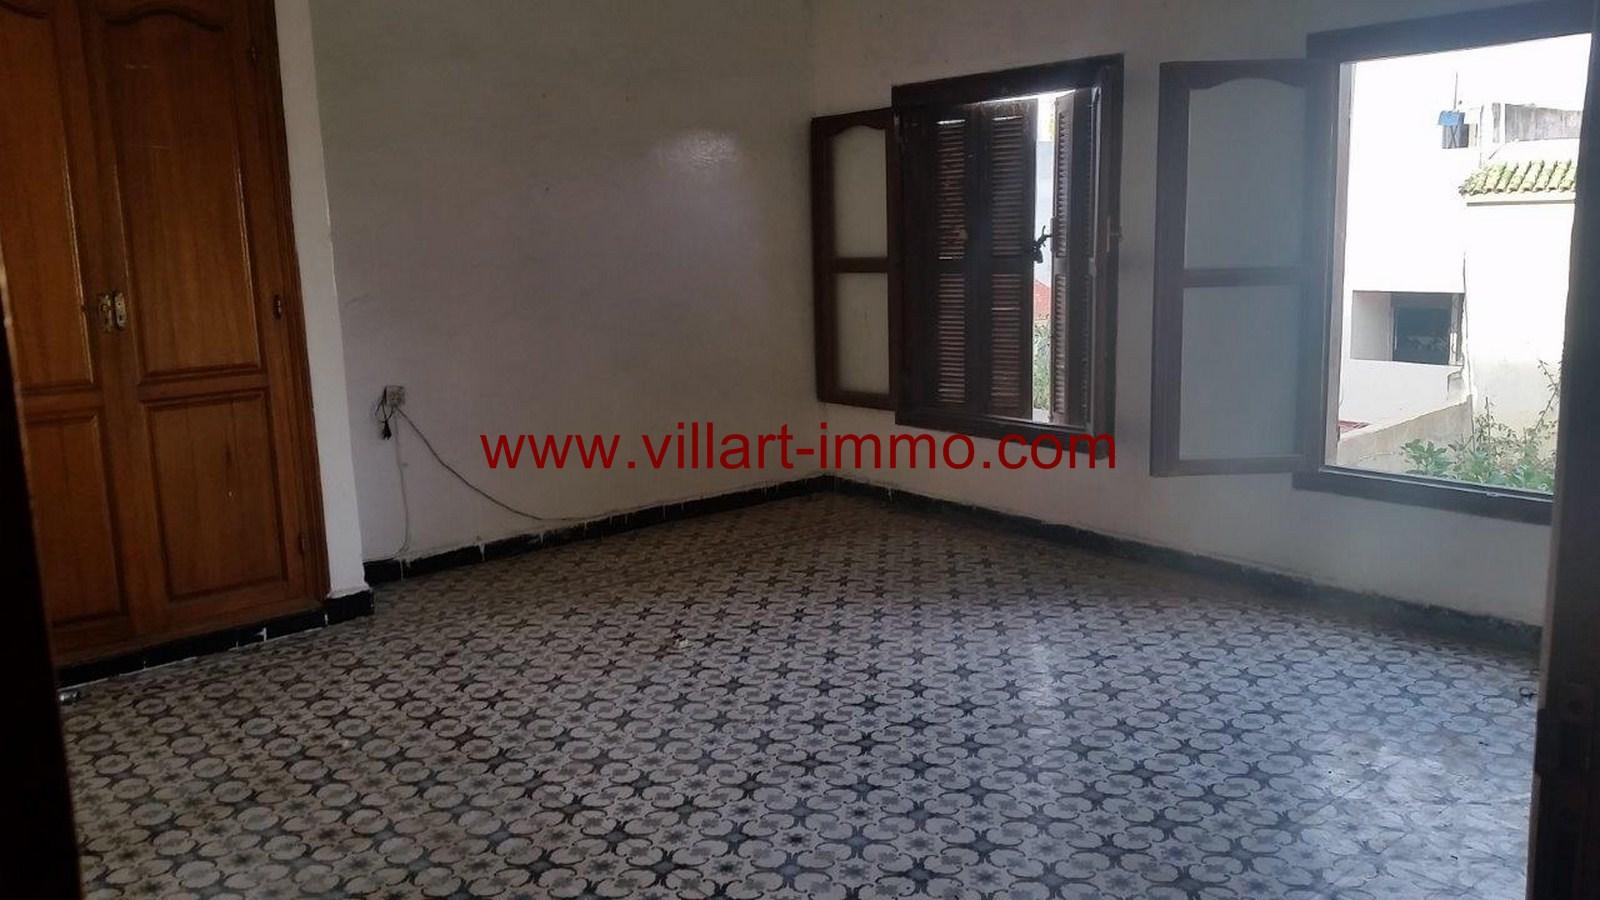 8-vente-maison-tanger-marchan-chambre-1-vm381-villart-immo